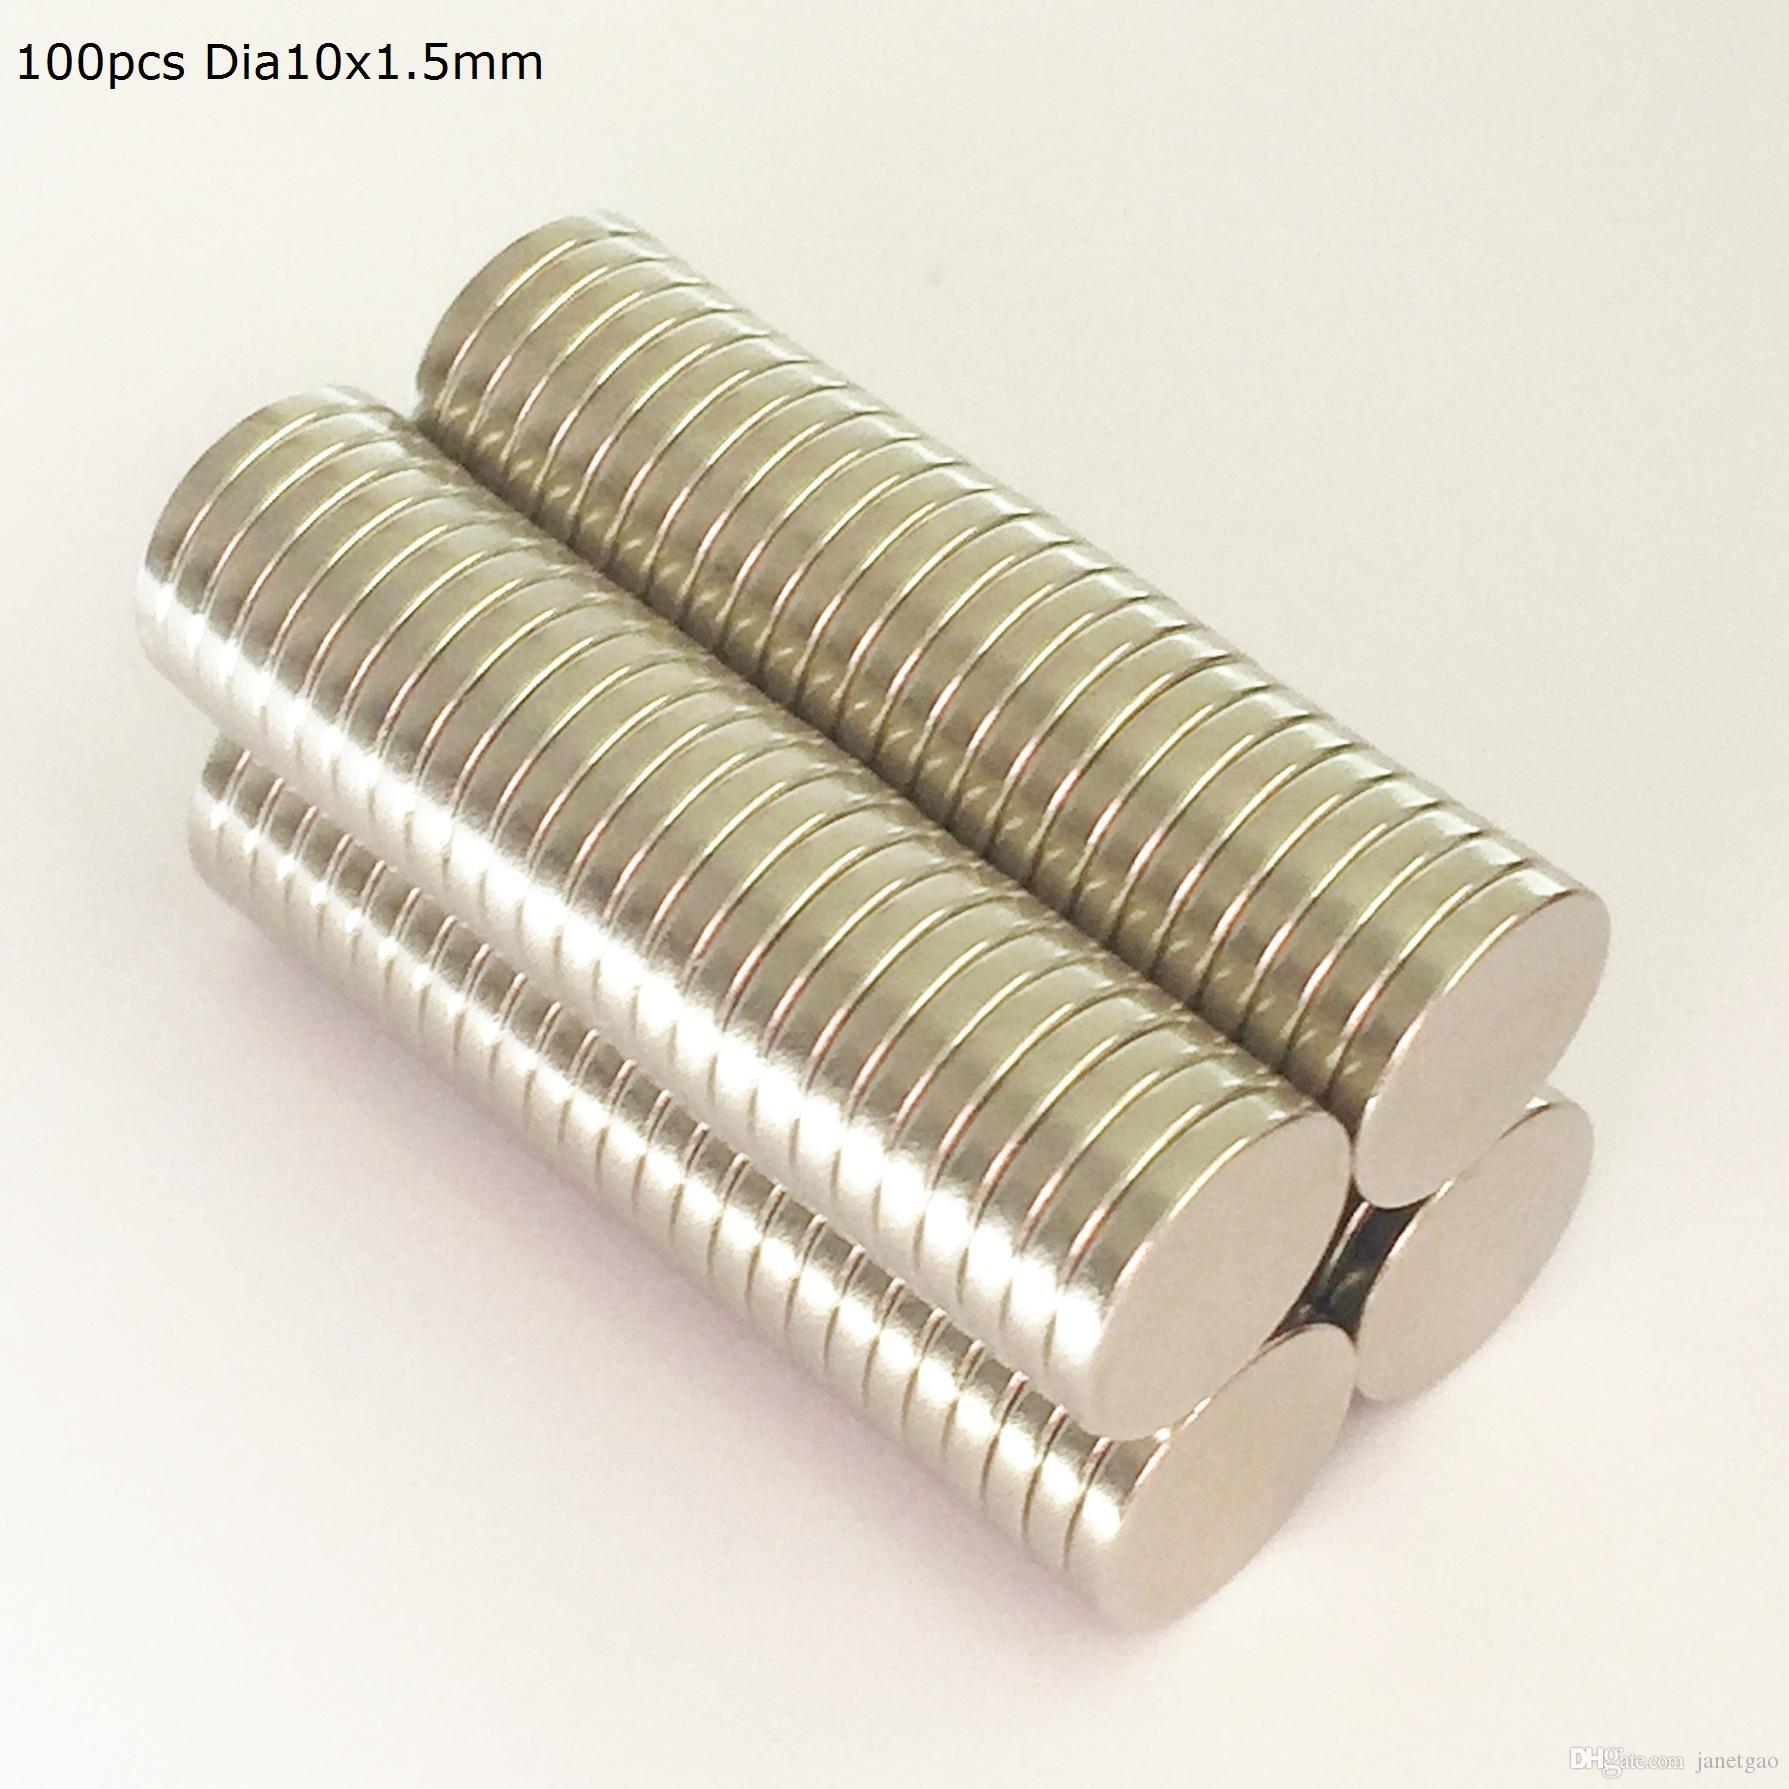 500pcs Neodymium Magnetic disc dia10x1.5mm N35 rare earth permanent strong quality neodymium magnet bulk NdFeB magnets nickle coated craft